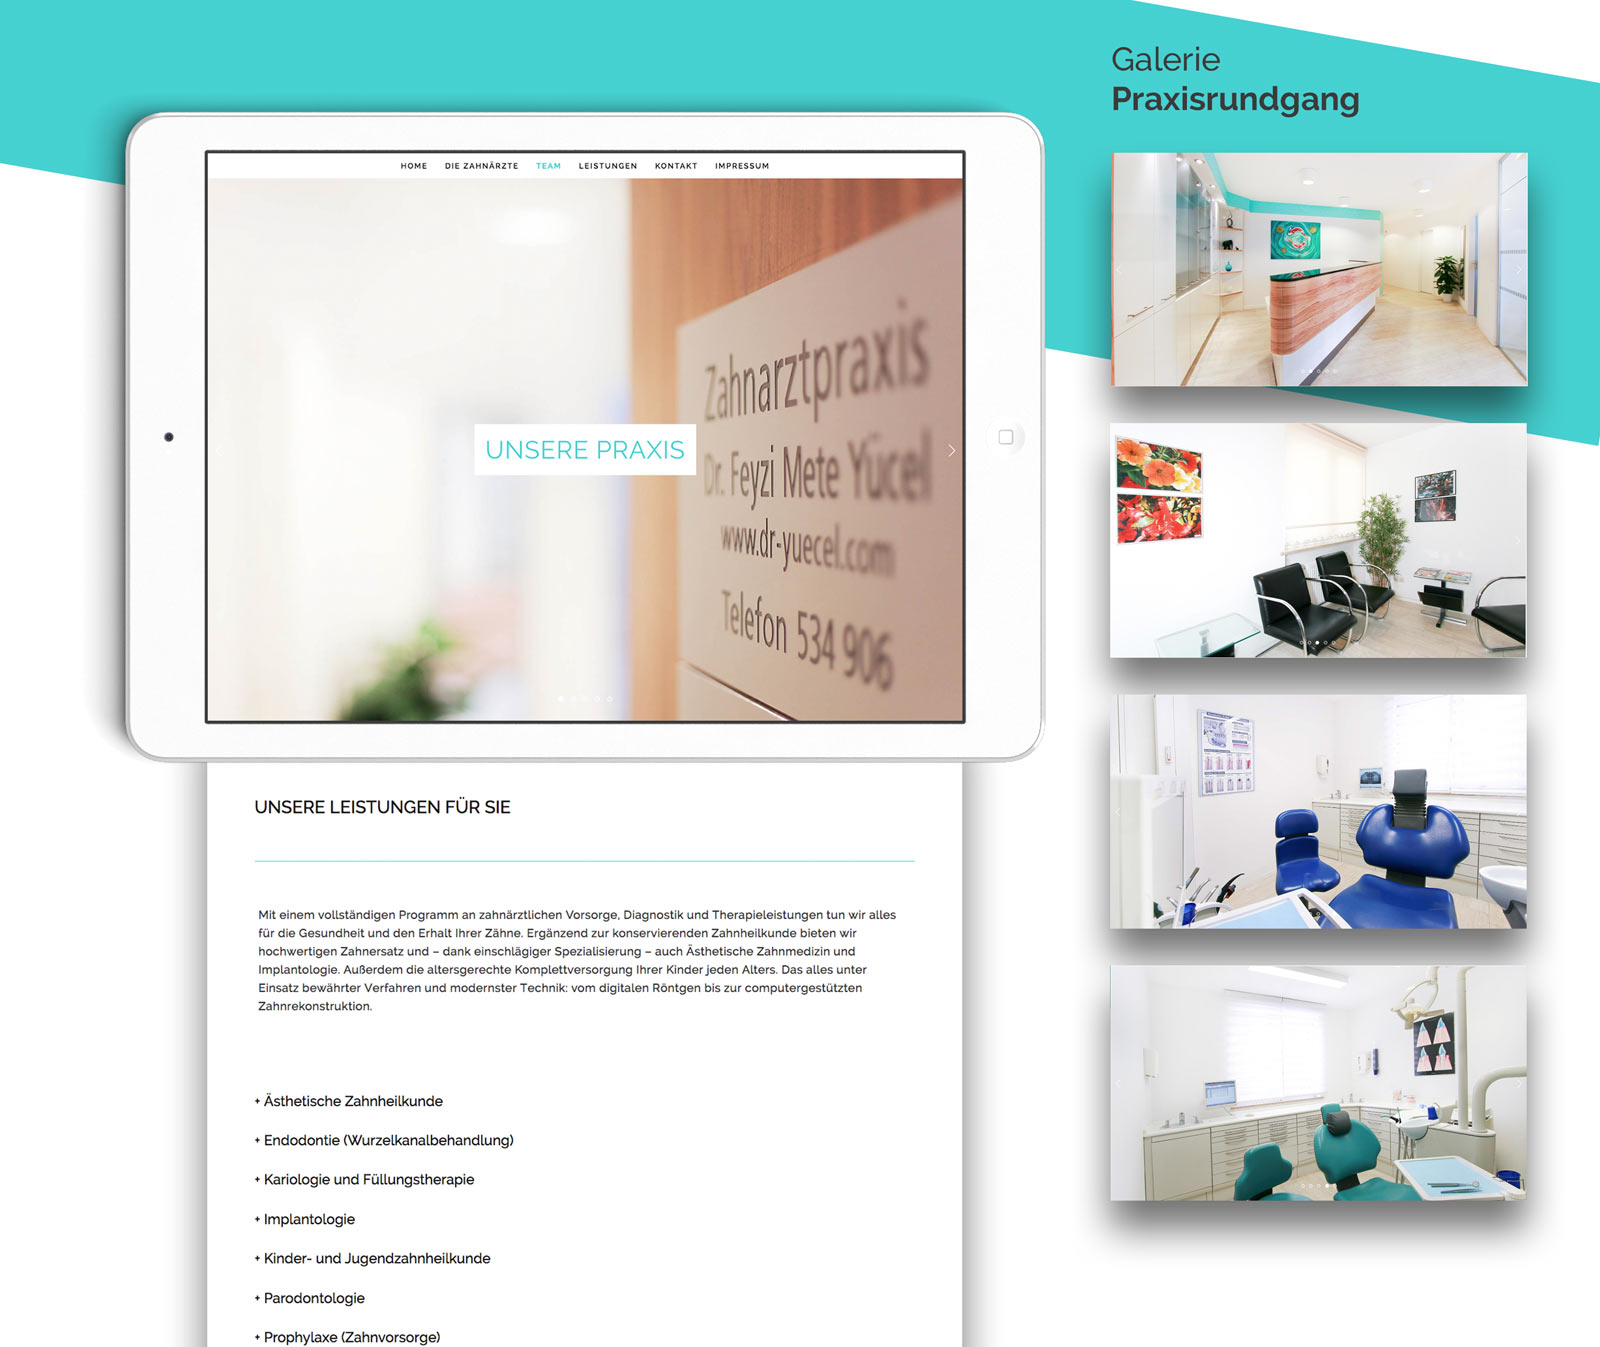 Zahnarzt_am_Goetheplatz_Responsive_Webdesign_4.jpg